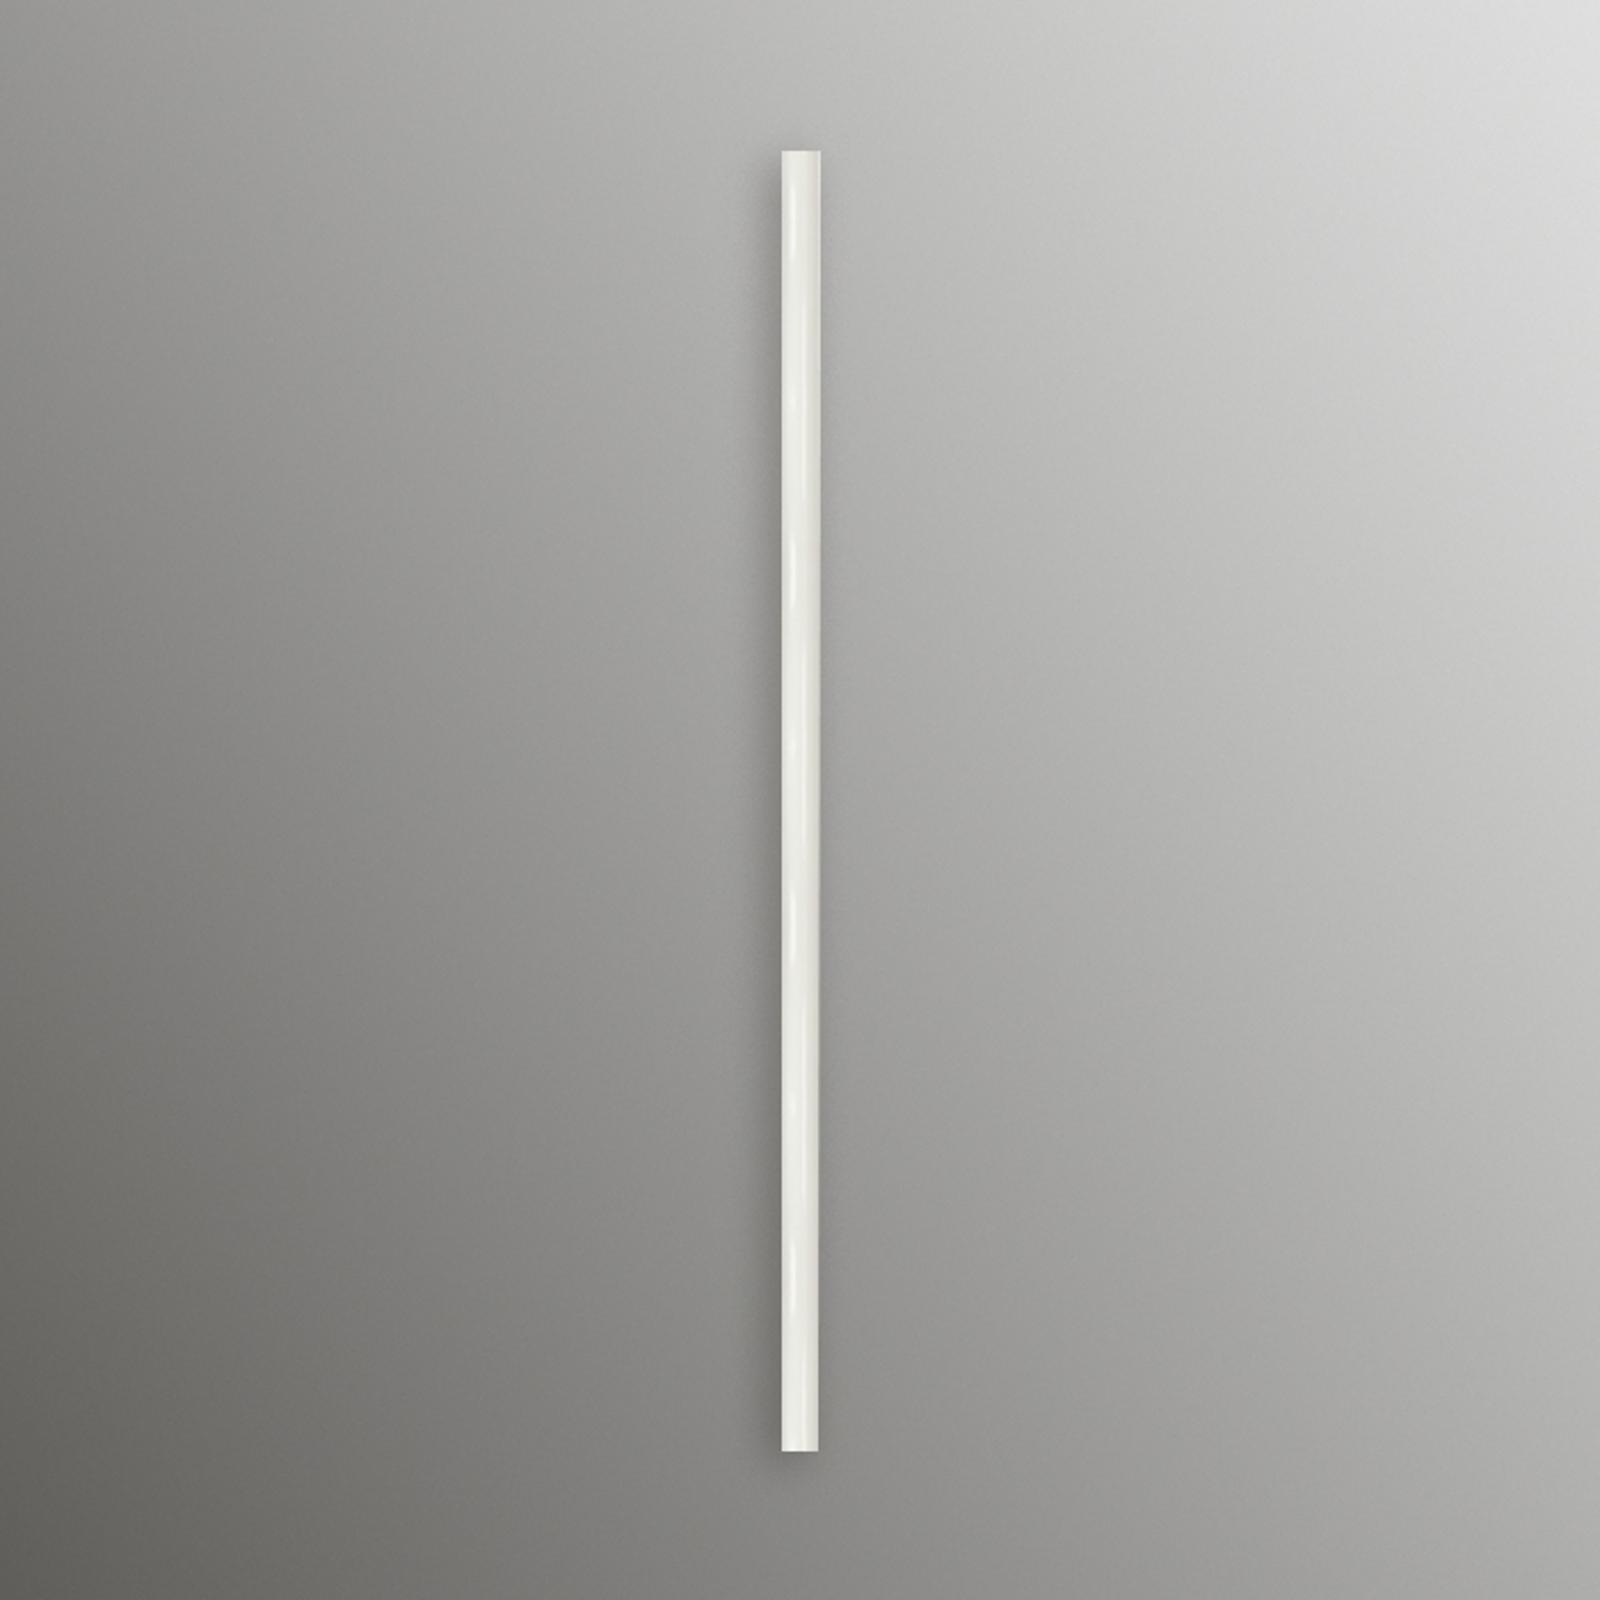 Extension rod white 120 cm_2015097_1